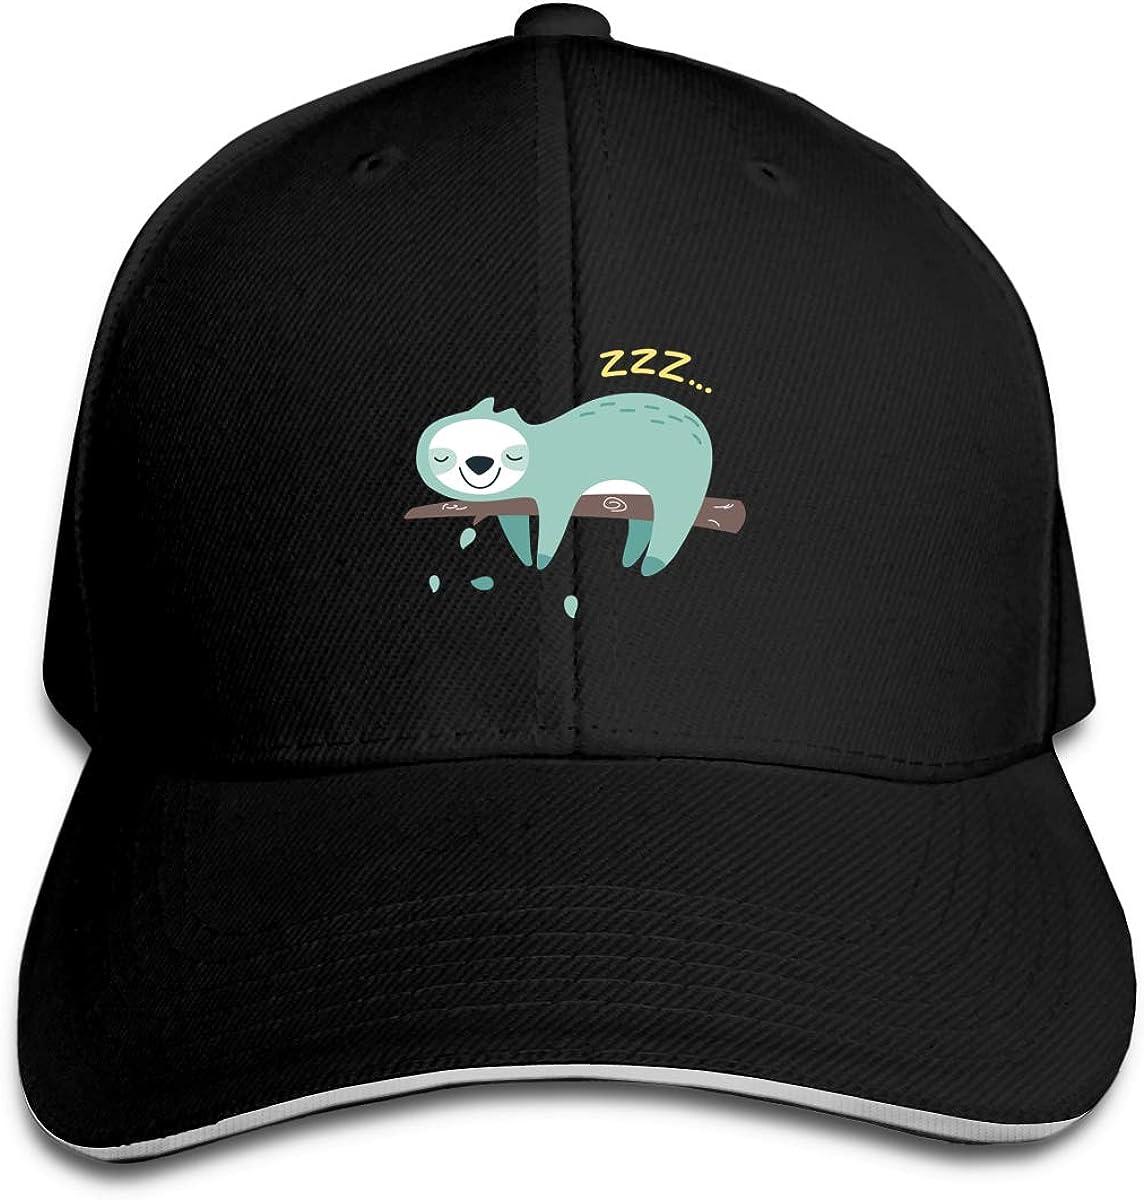 Lazy Sloth Logo Classic Adjustable Cotton Baseball Caps Trucker Driver Hat Outdoor Cap Black